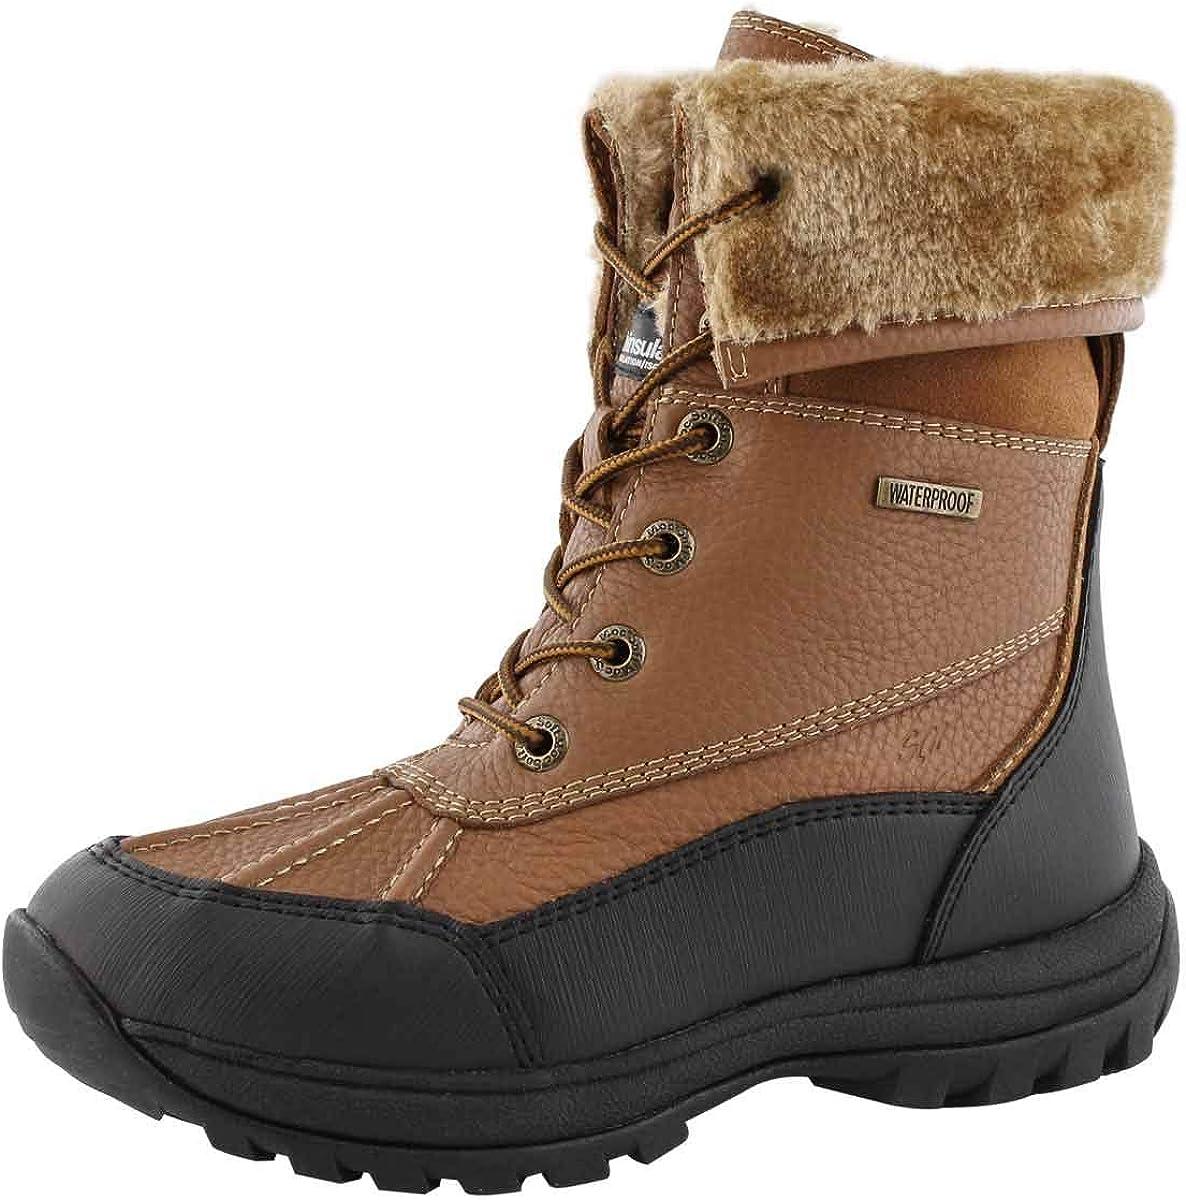 SoftMoc Womens Shakira 3 Foldover Cuff Waterproof Boot